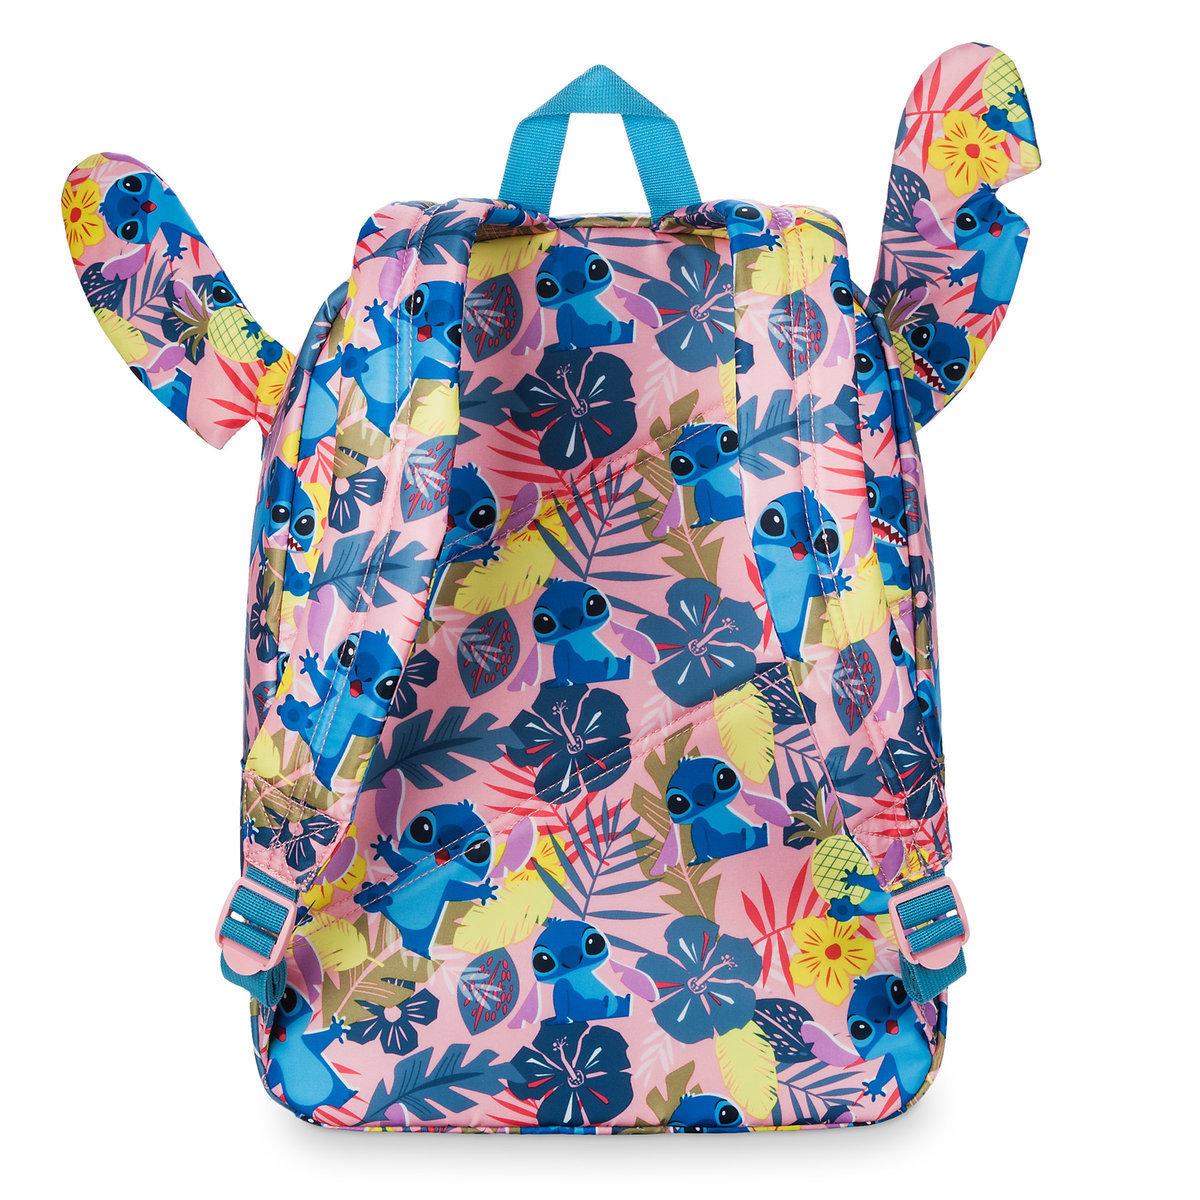 Детский рюкзак «Стич» - Disney